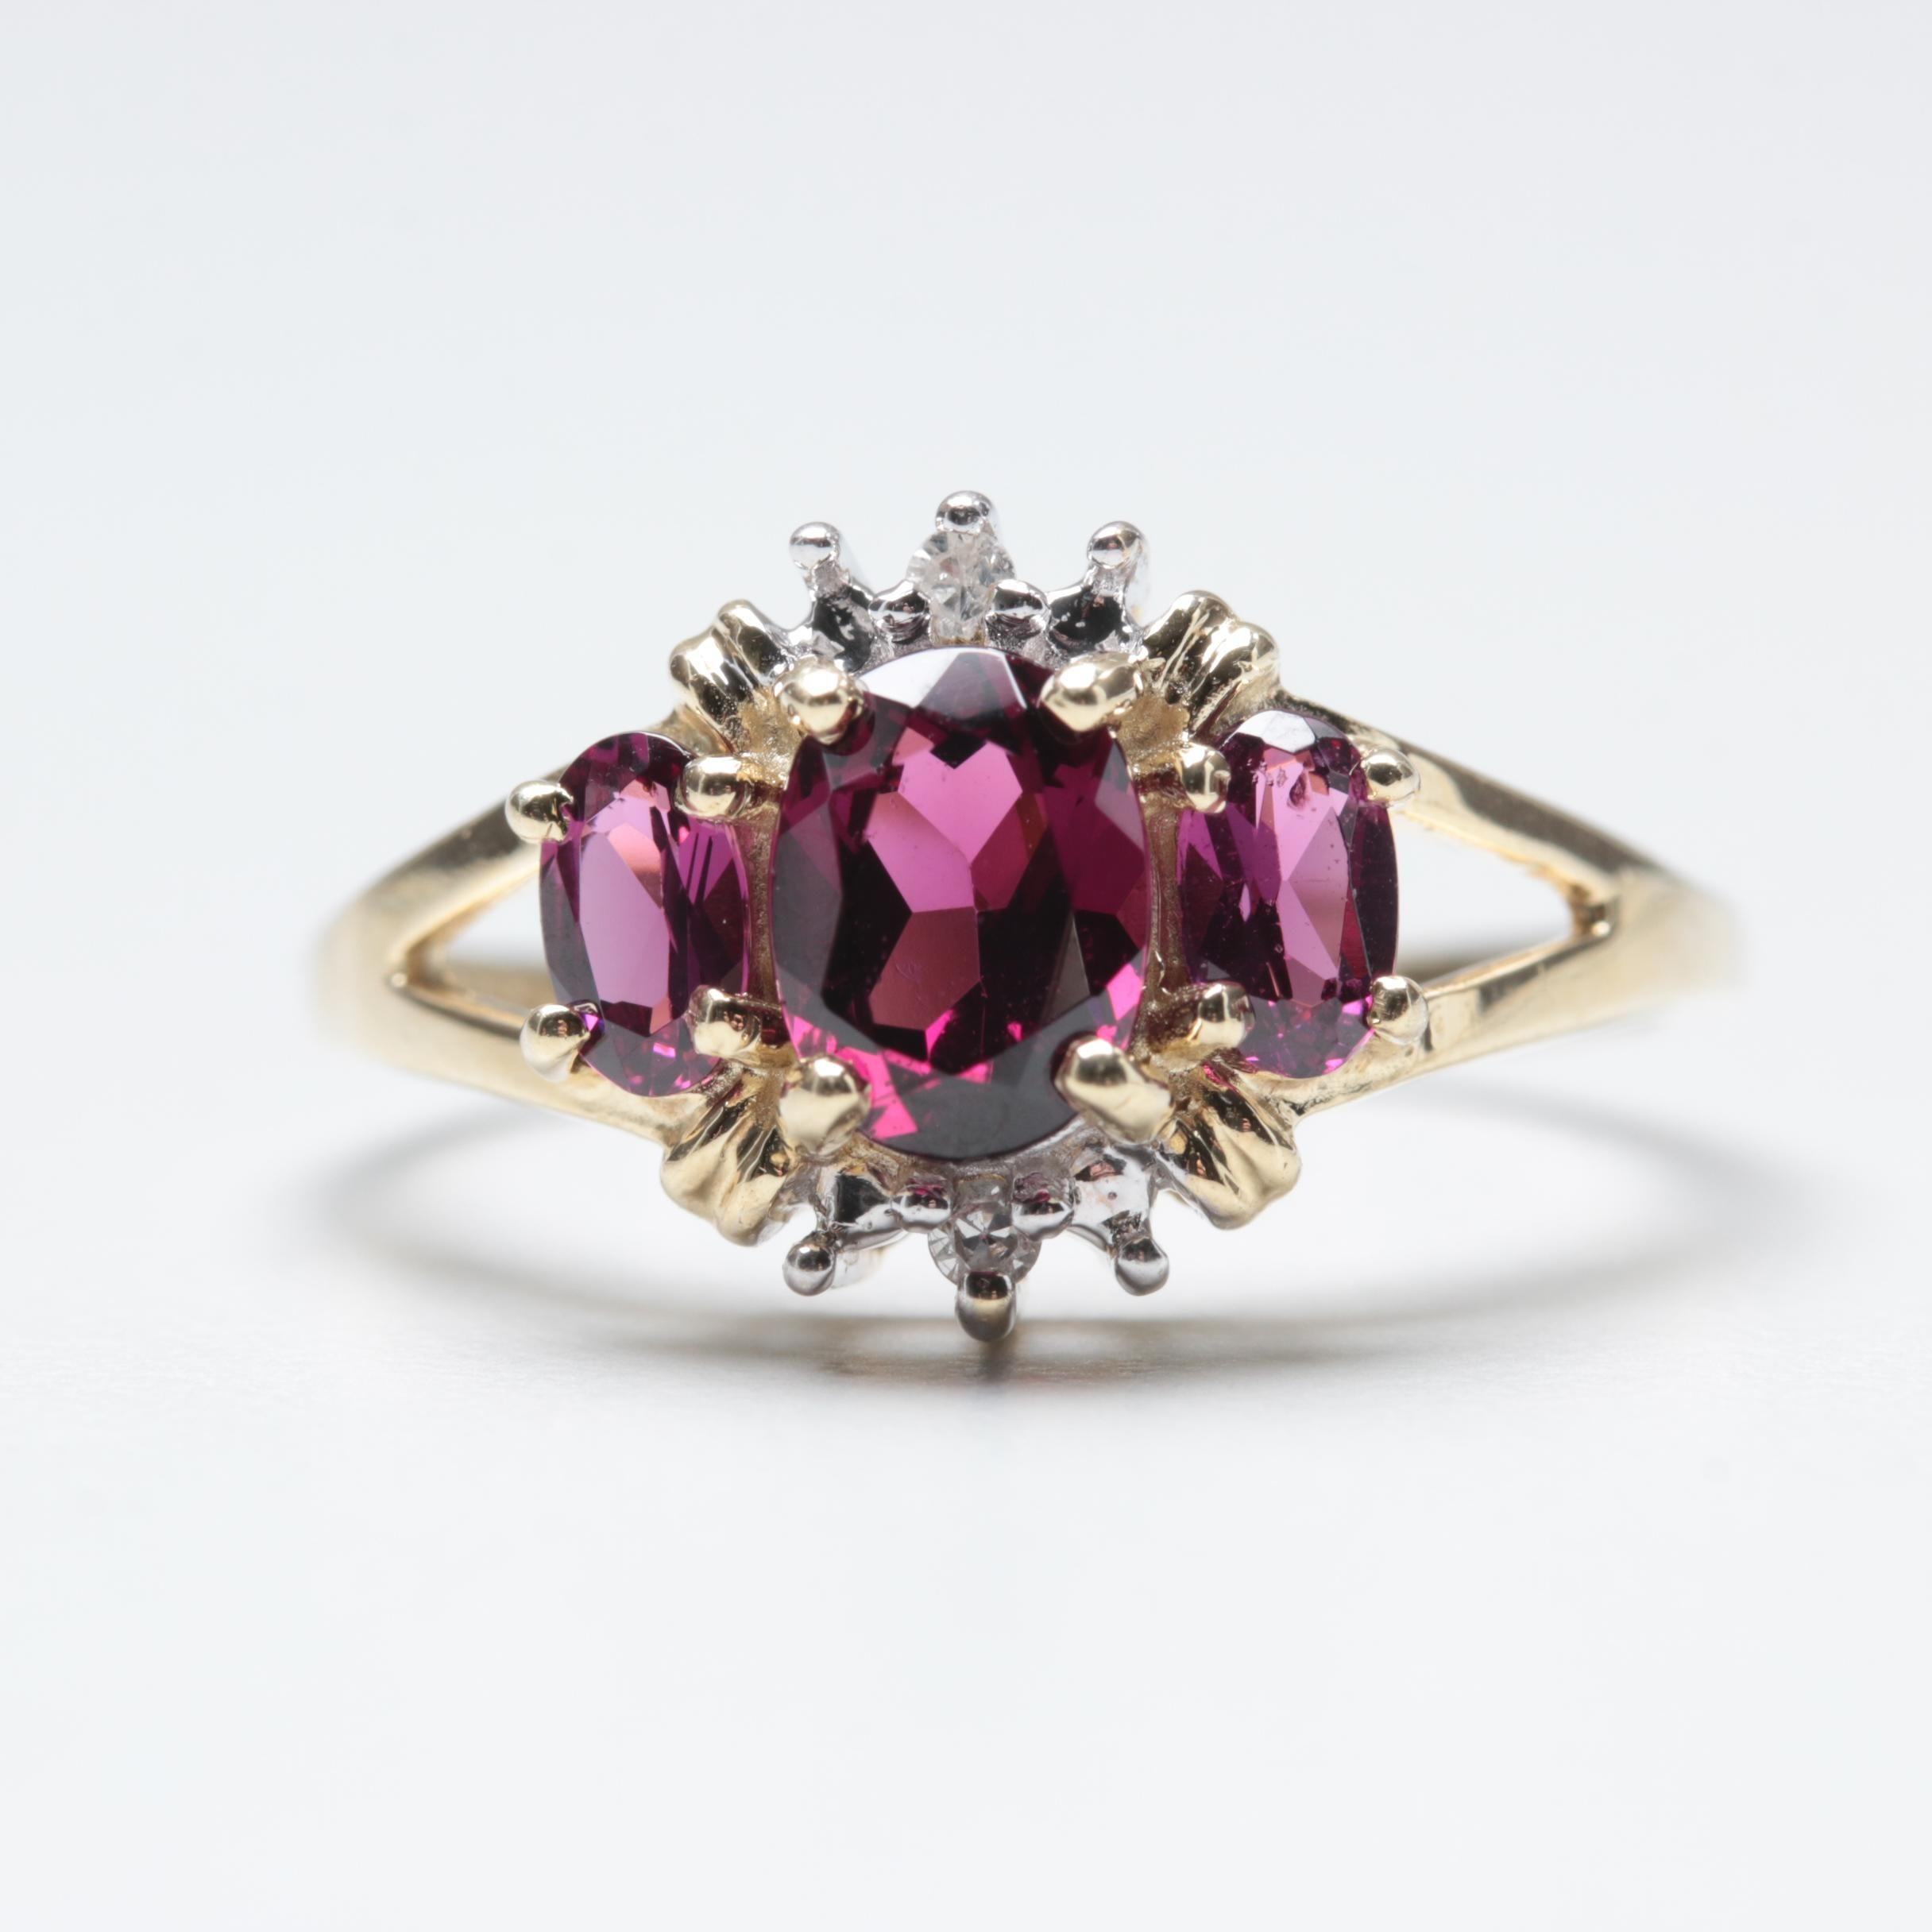 10K Yellow Gold Rhodolite Garnet and Diamond Ring